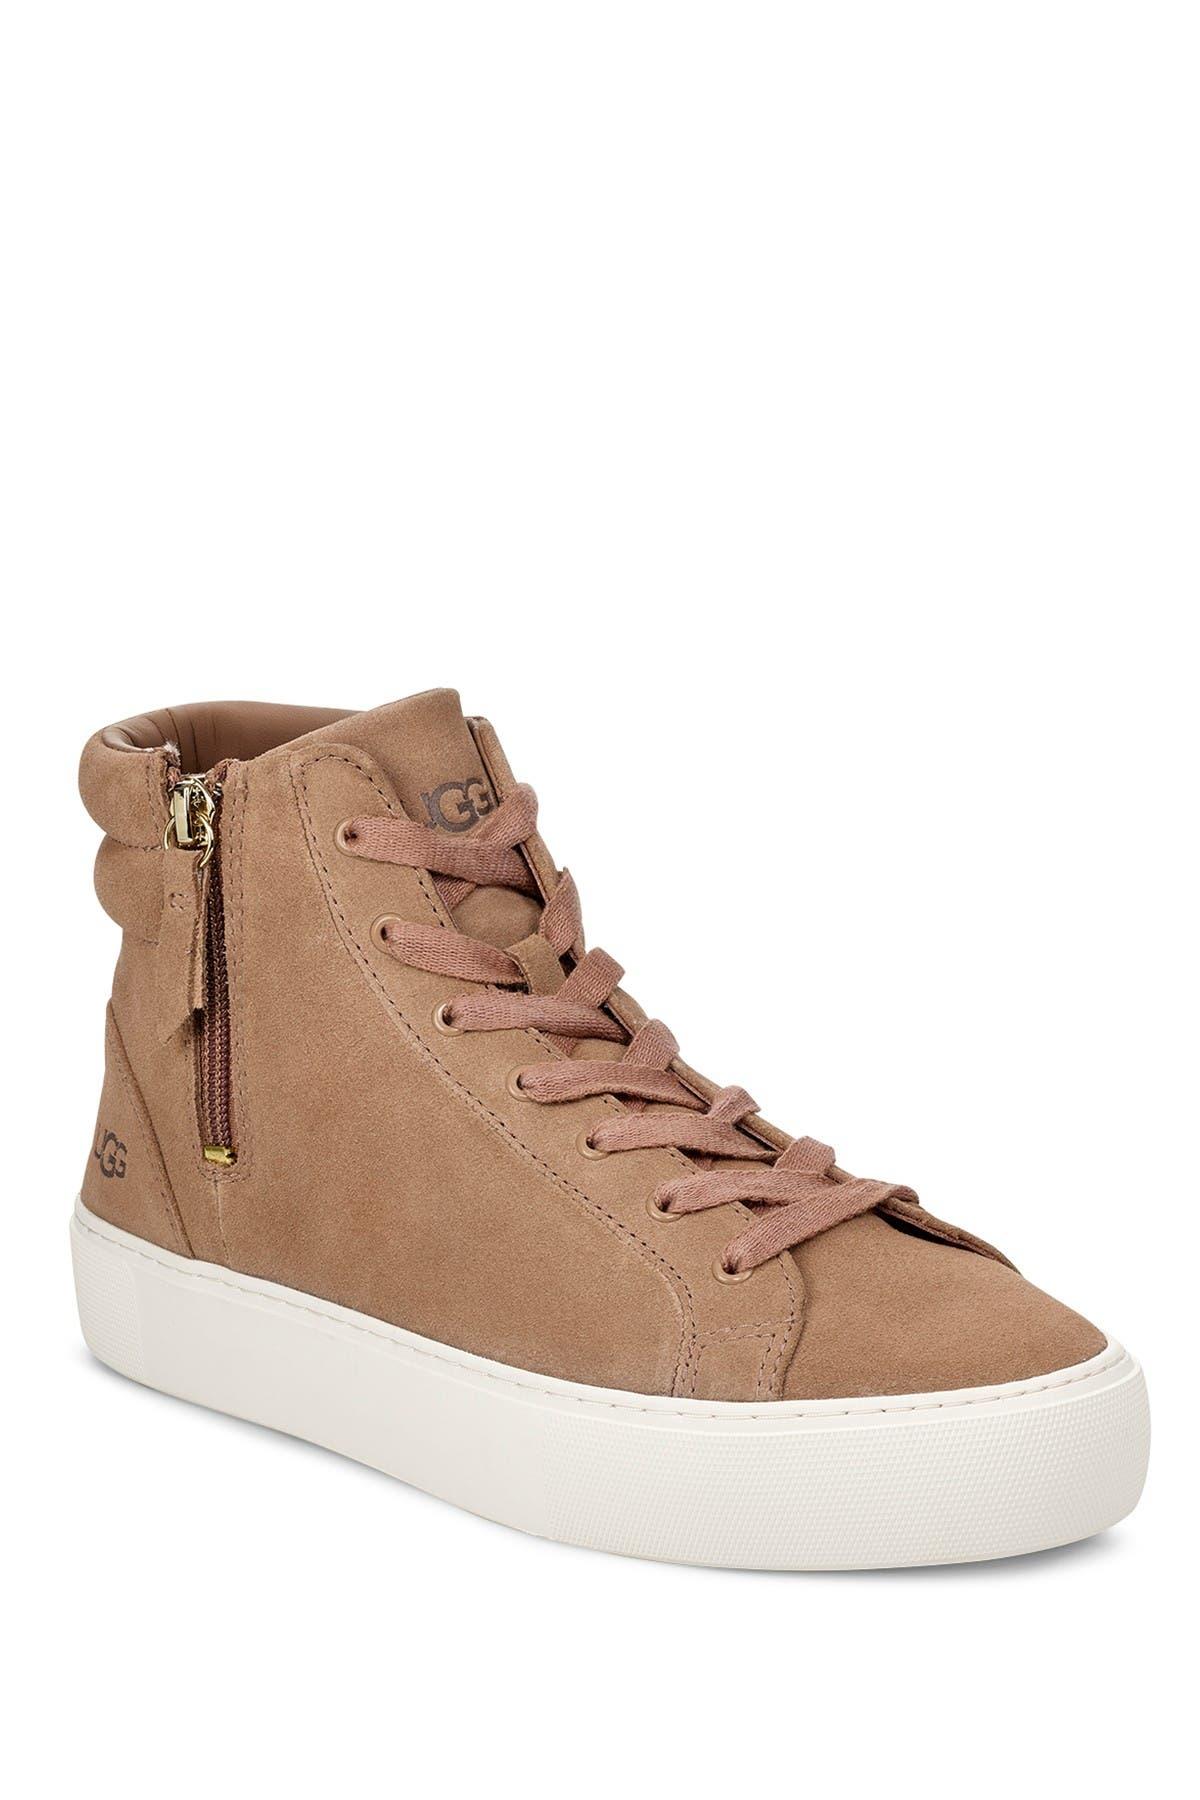 UGG | Olli High Top Sneaker | Nordstrom